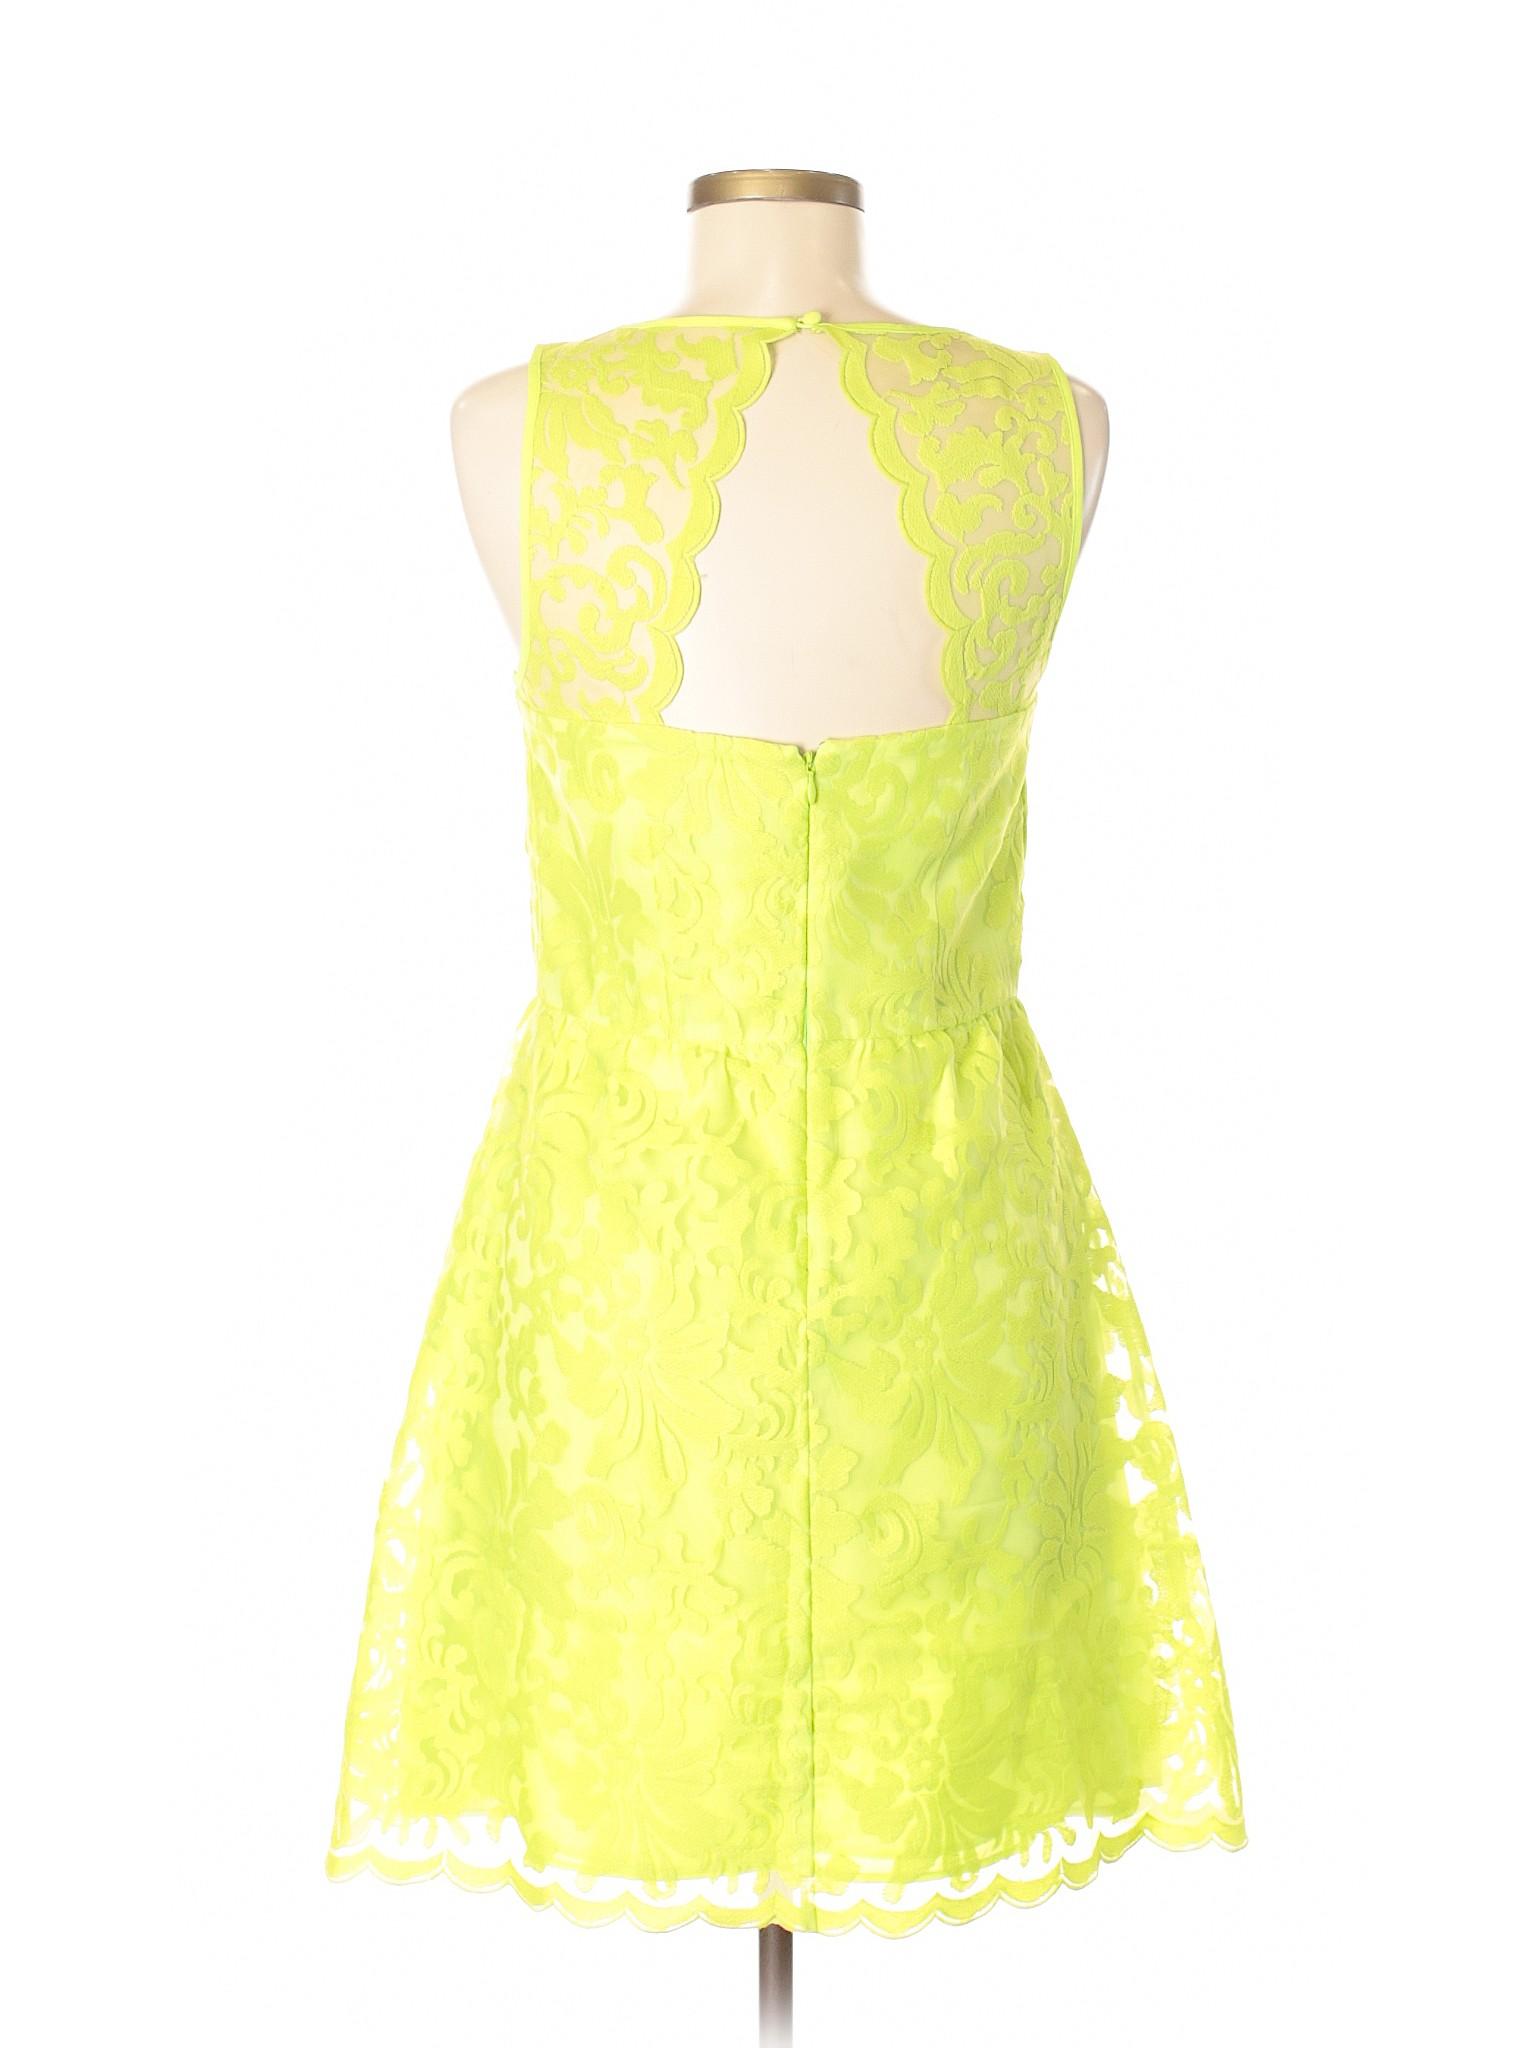 Segal Shelli Laundry winter Dress by Boutique Cocktail vqIfU411W